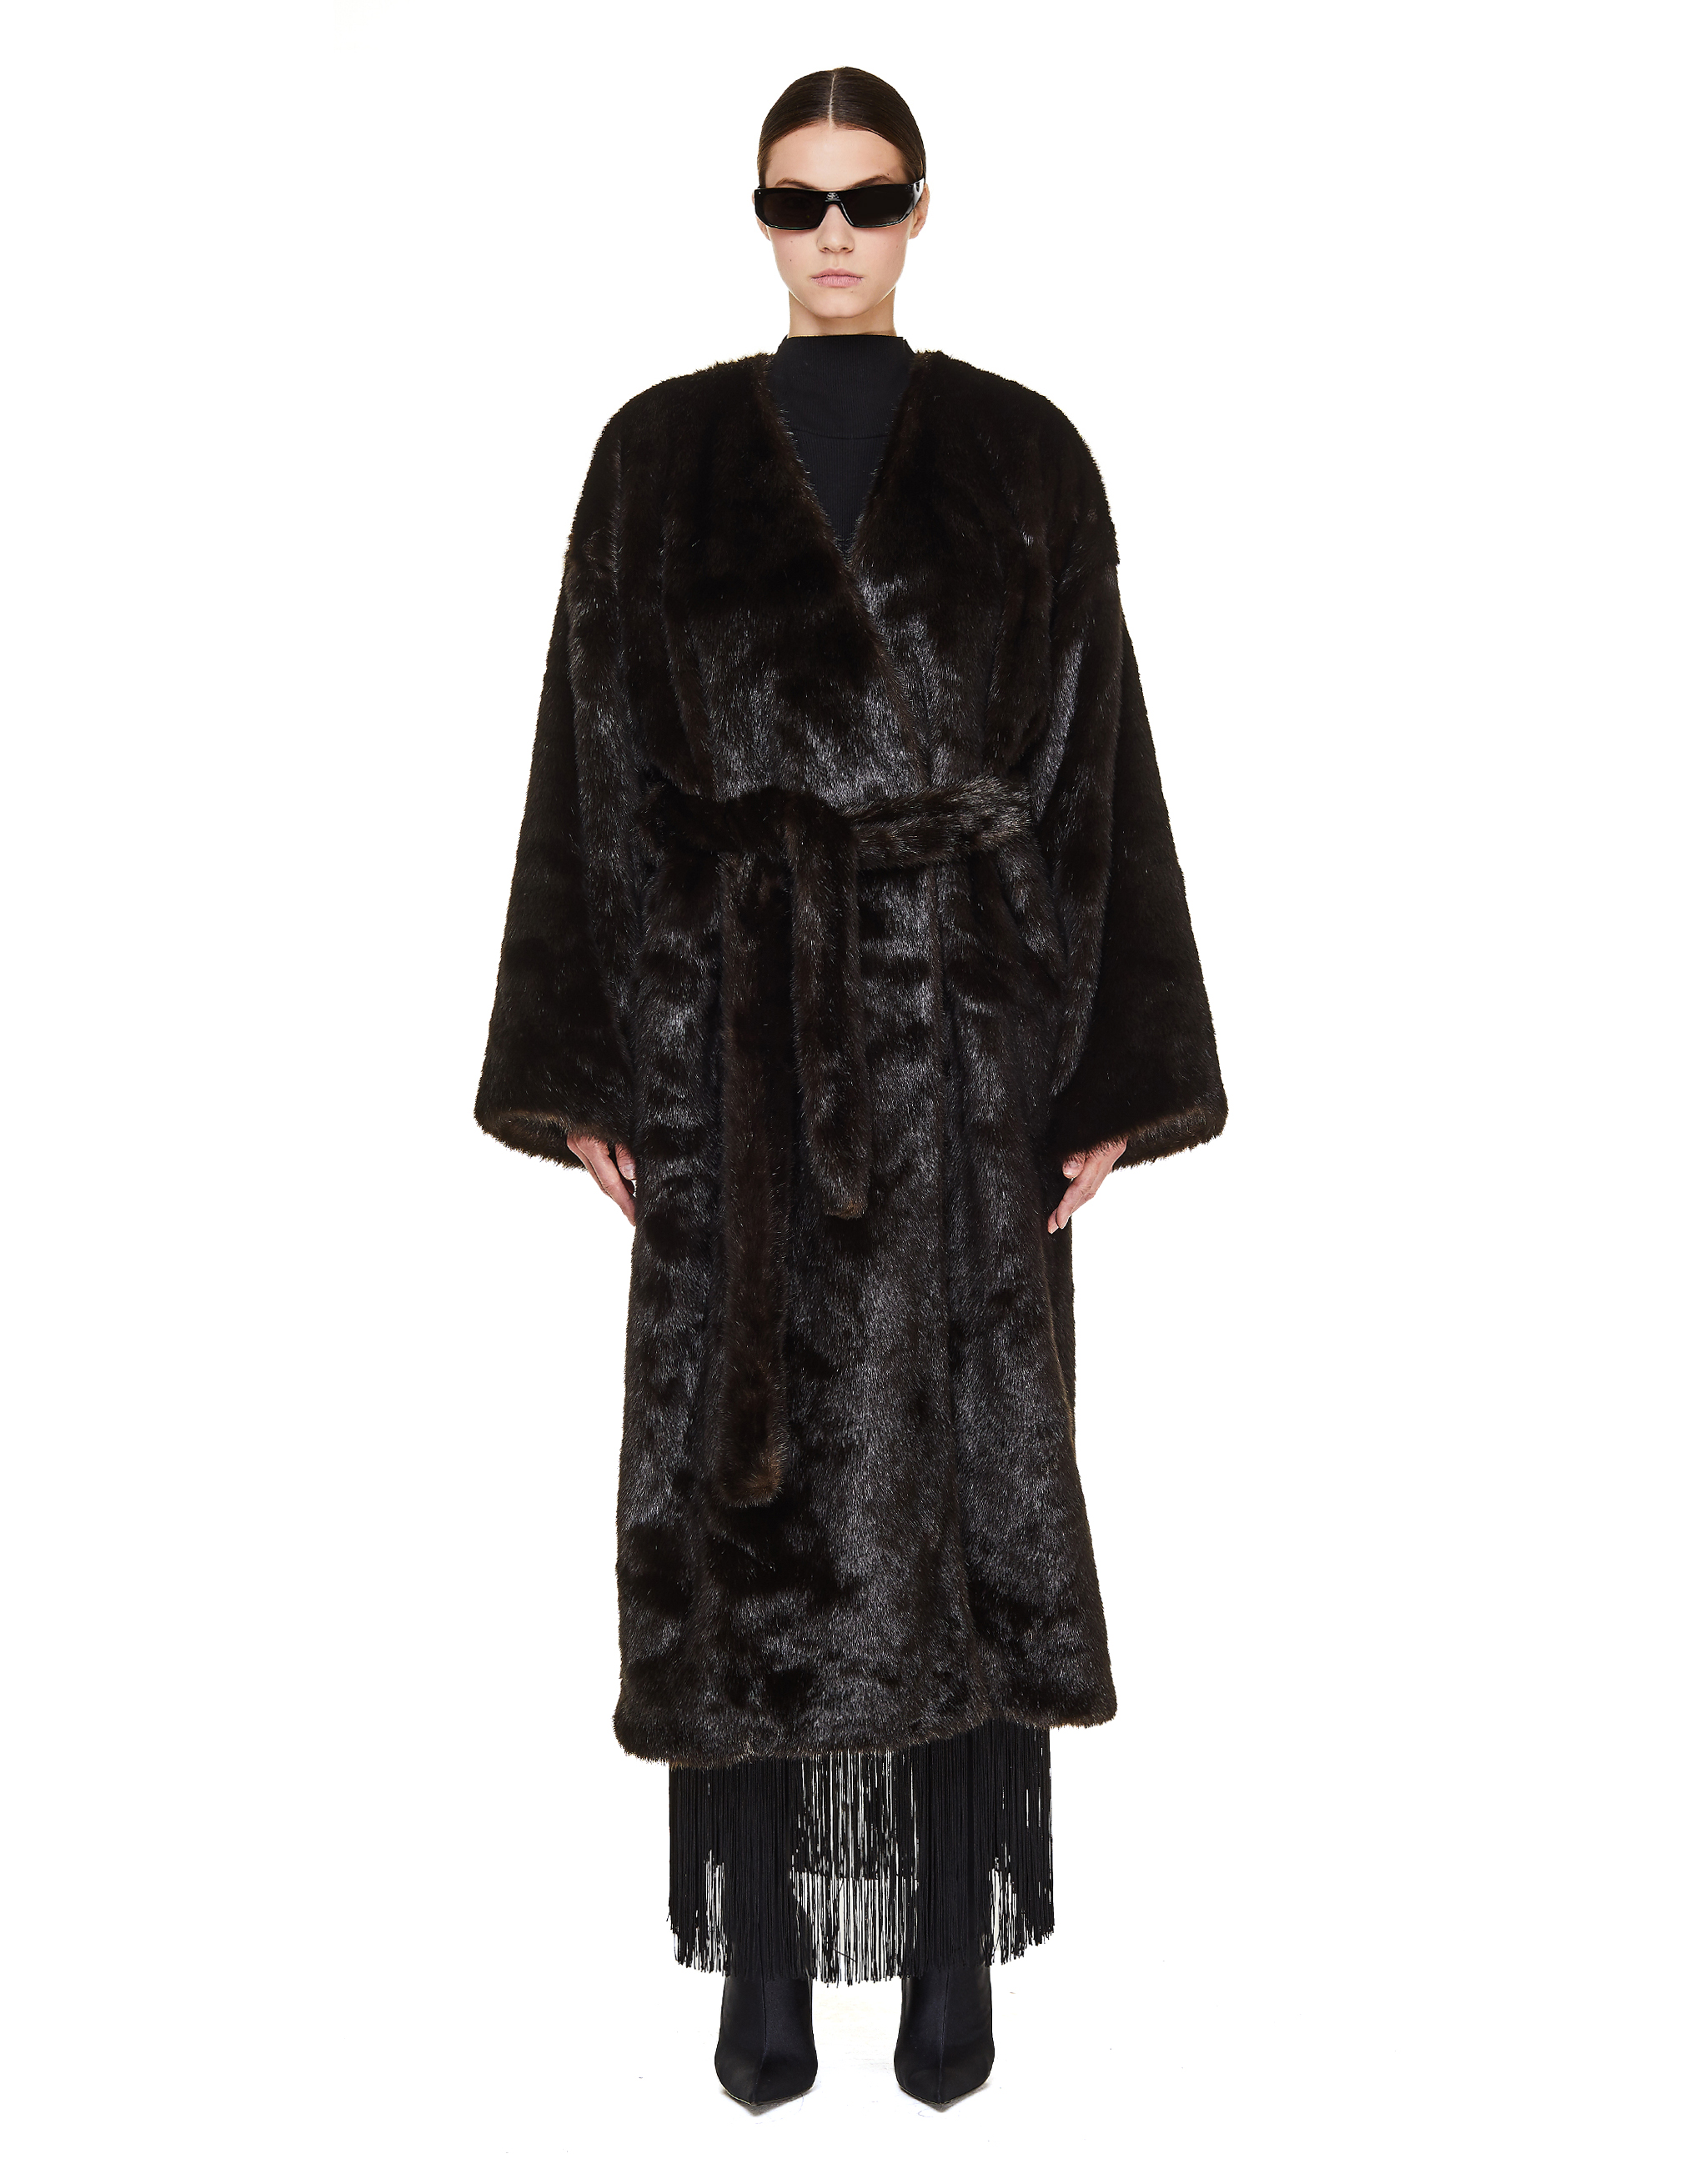 Balenciaga Brown Faux Fur Coat